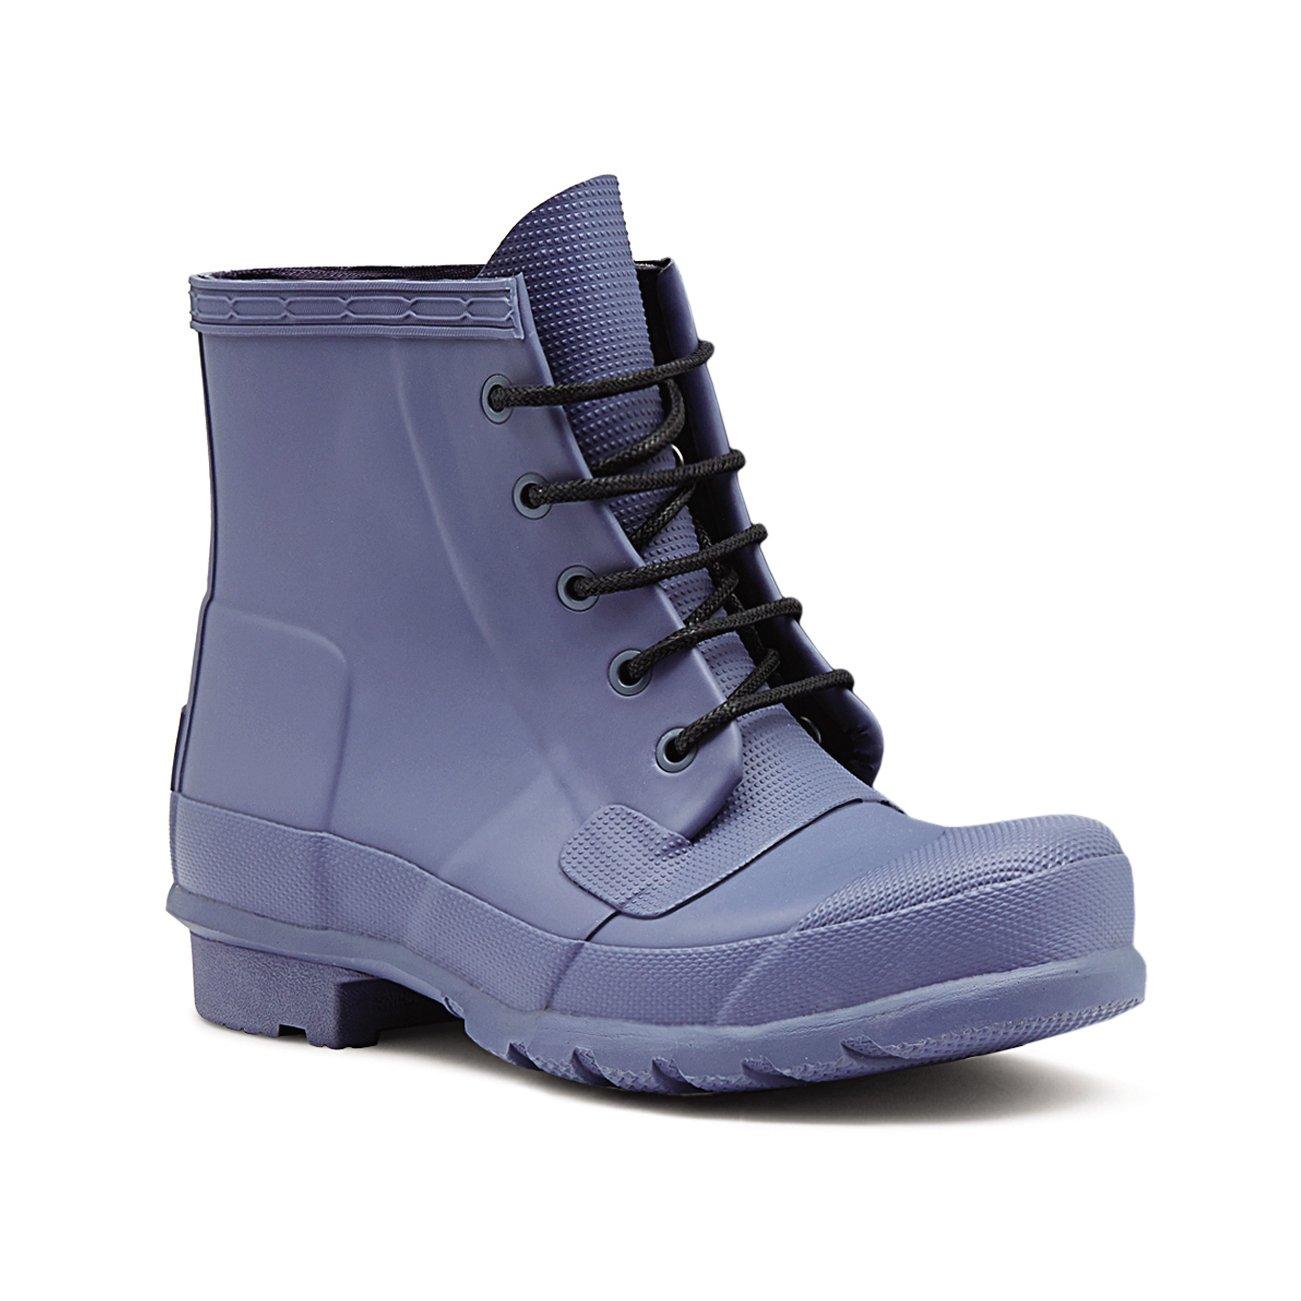 Womens Hunter Original Lace up Wellingtons Waterproof Rain Ankle Boots B01DKRI4P2 10 B(M) US Sky Blue